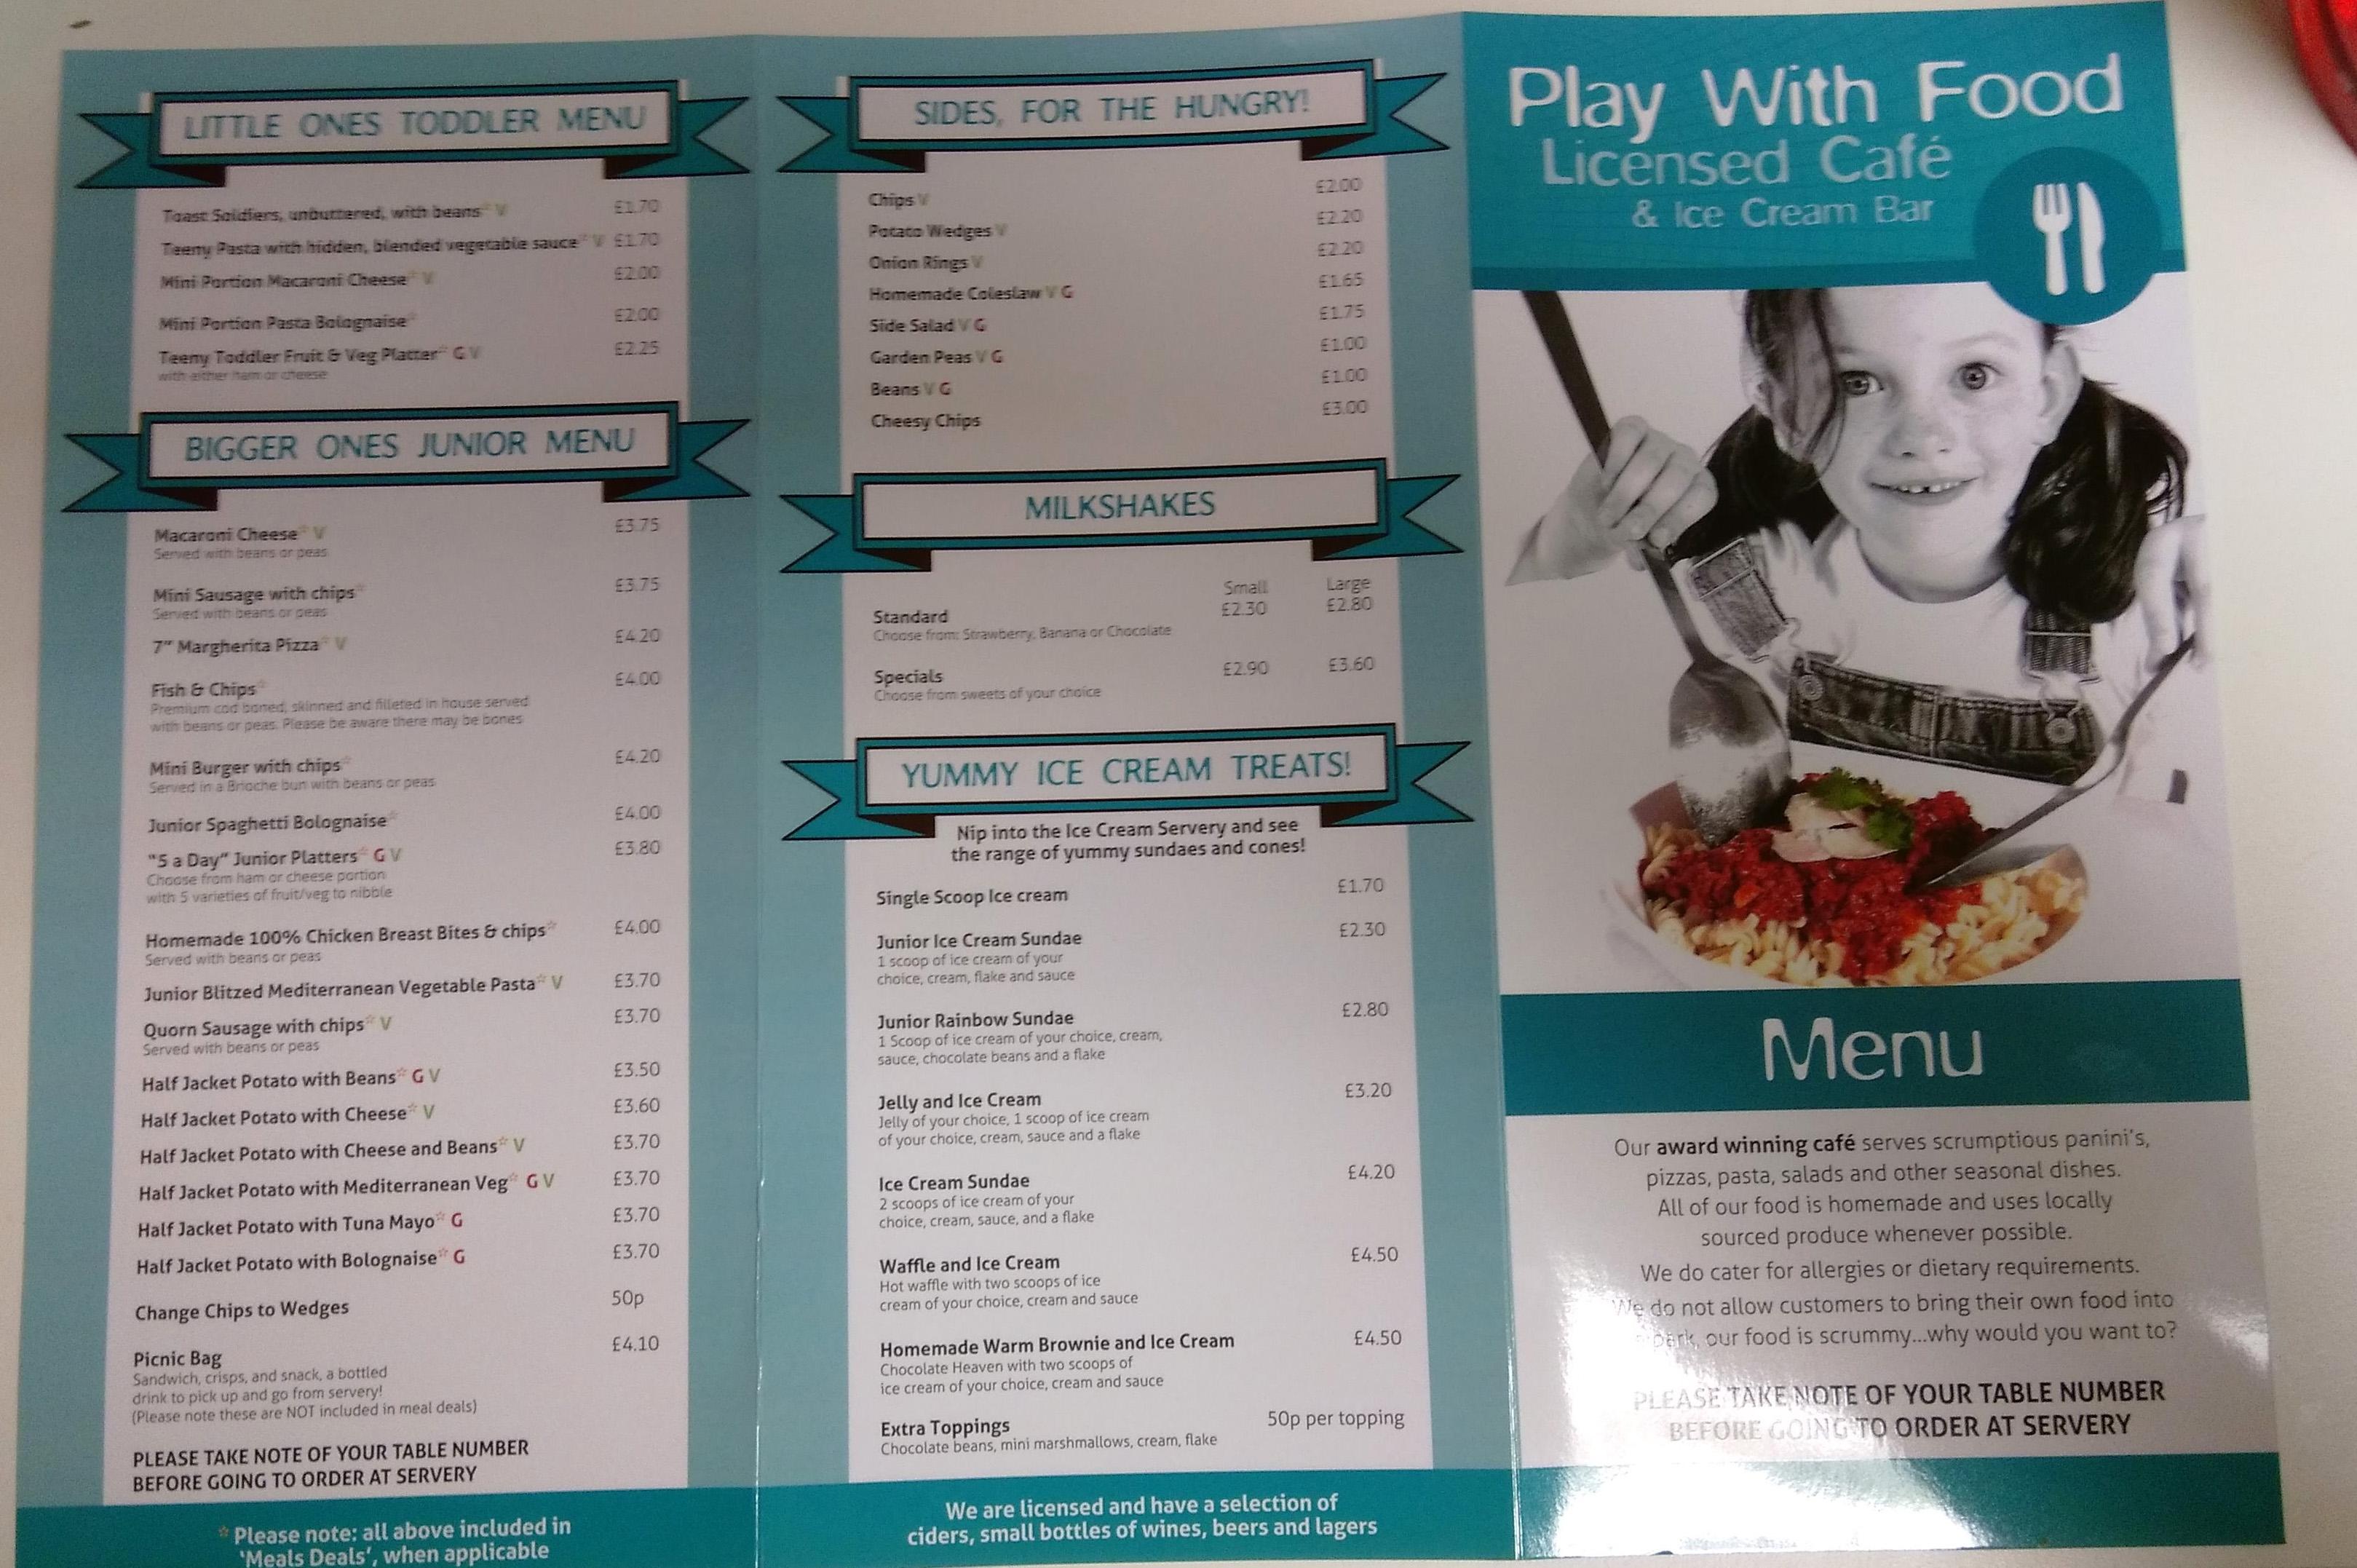 creepy crawlies menu front